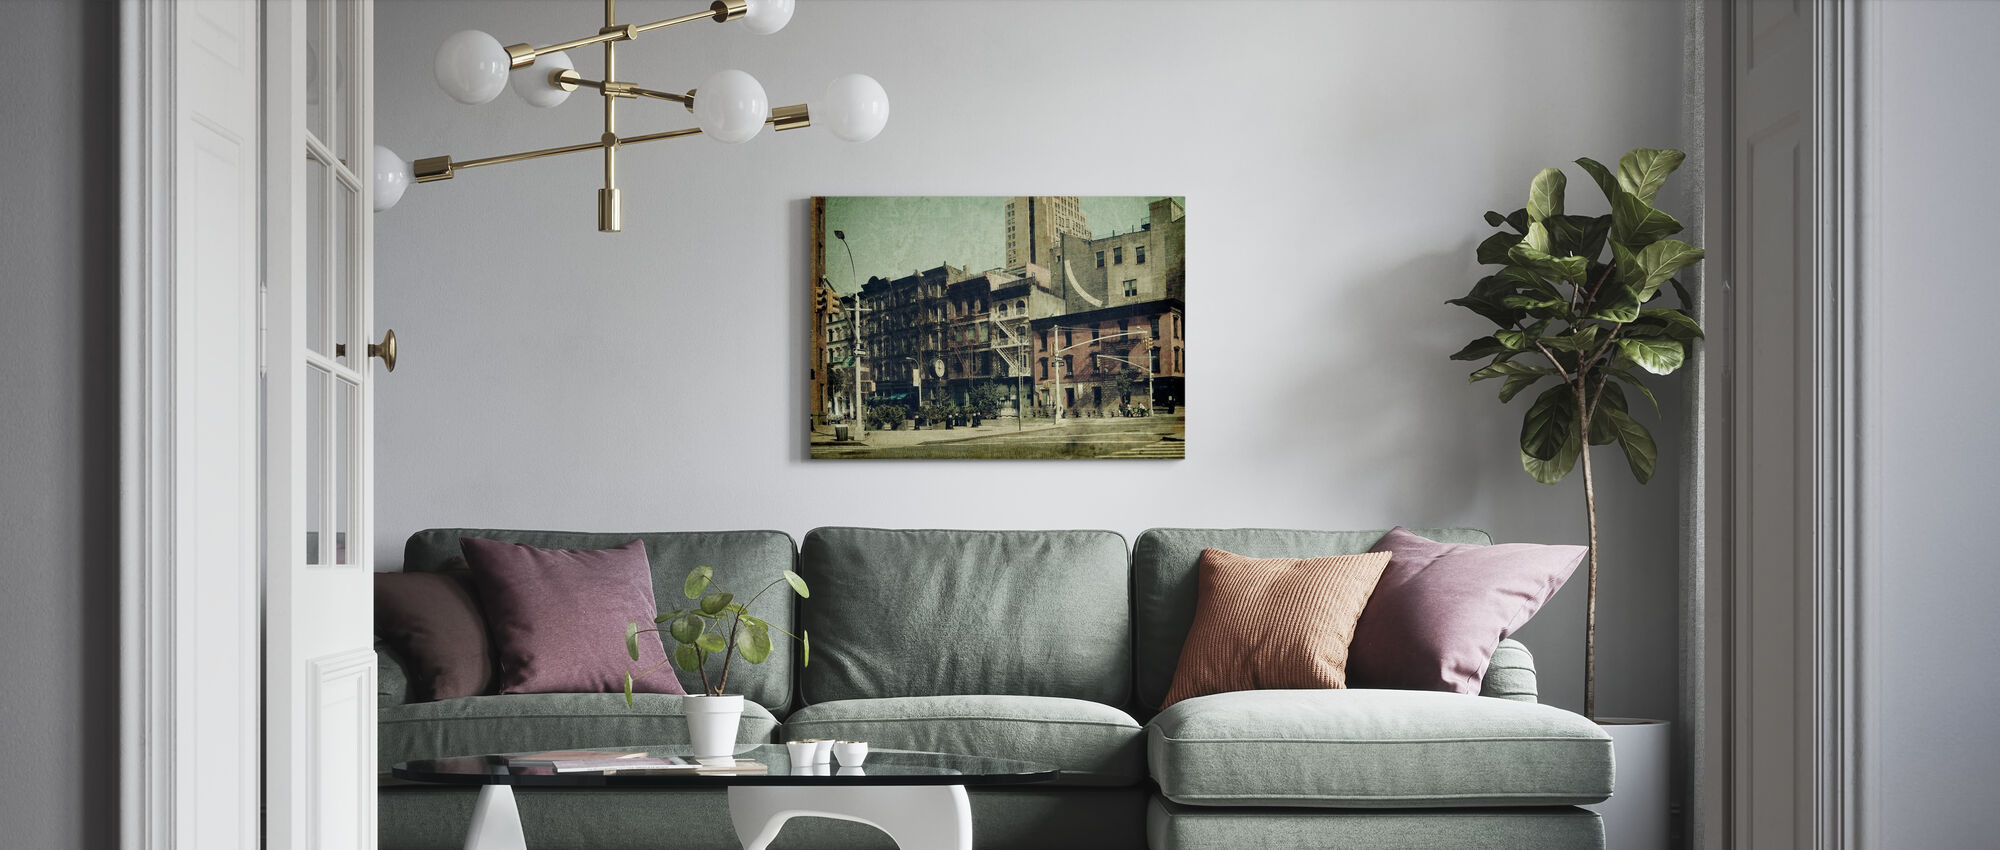 New York City - Sixth Avenue - Canvas print - Living Room